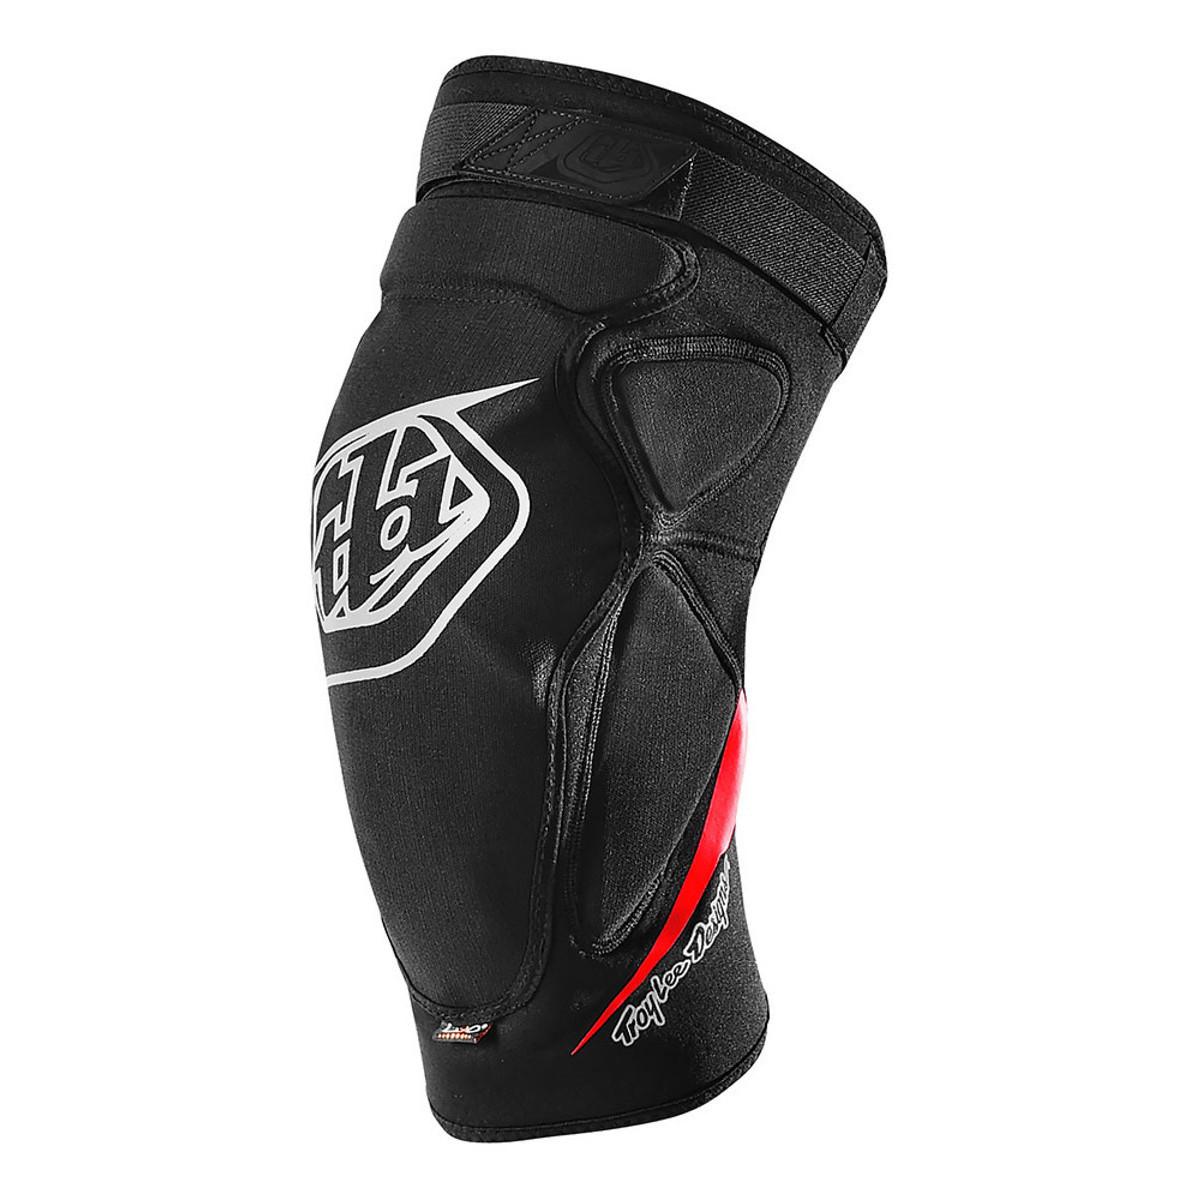 Вело наколенники TLD Raid Knee Guard [Black] размер XL/2X